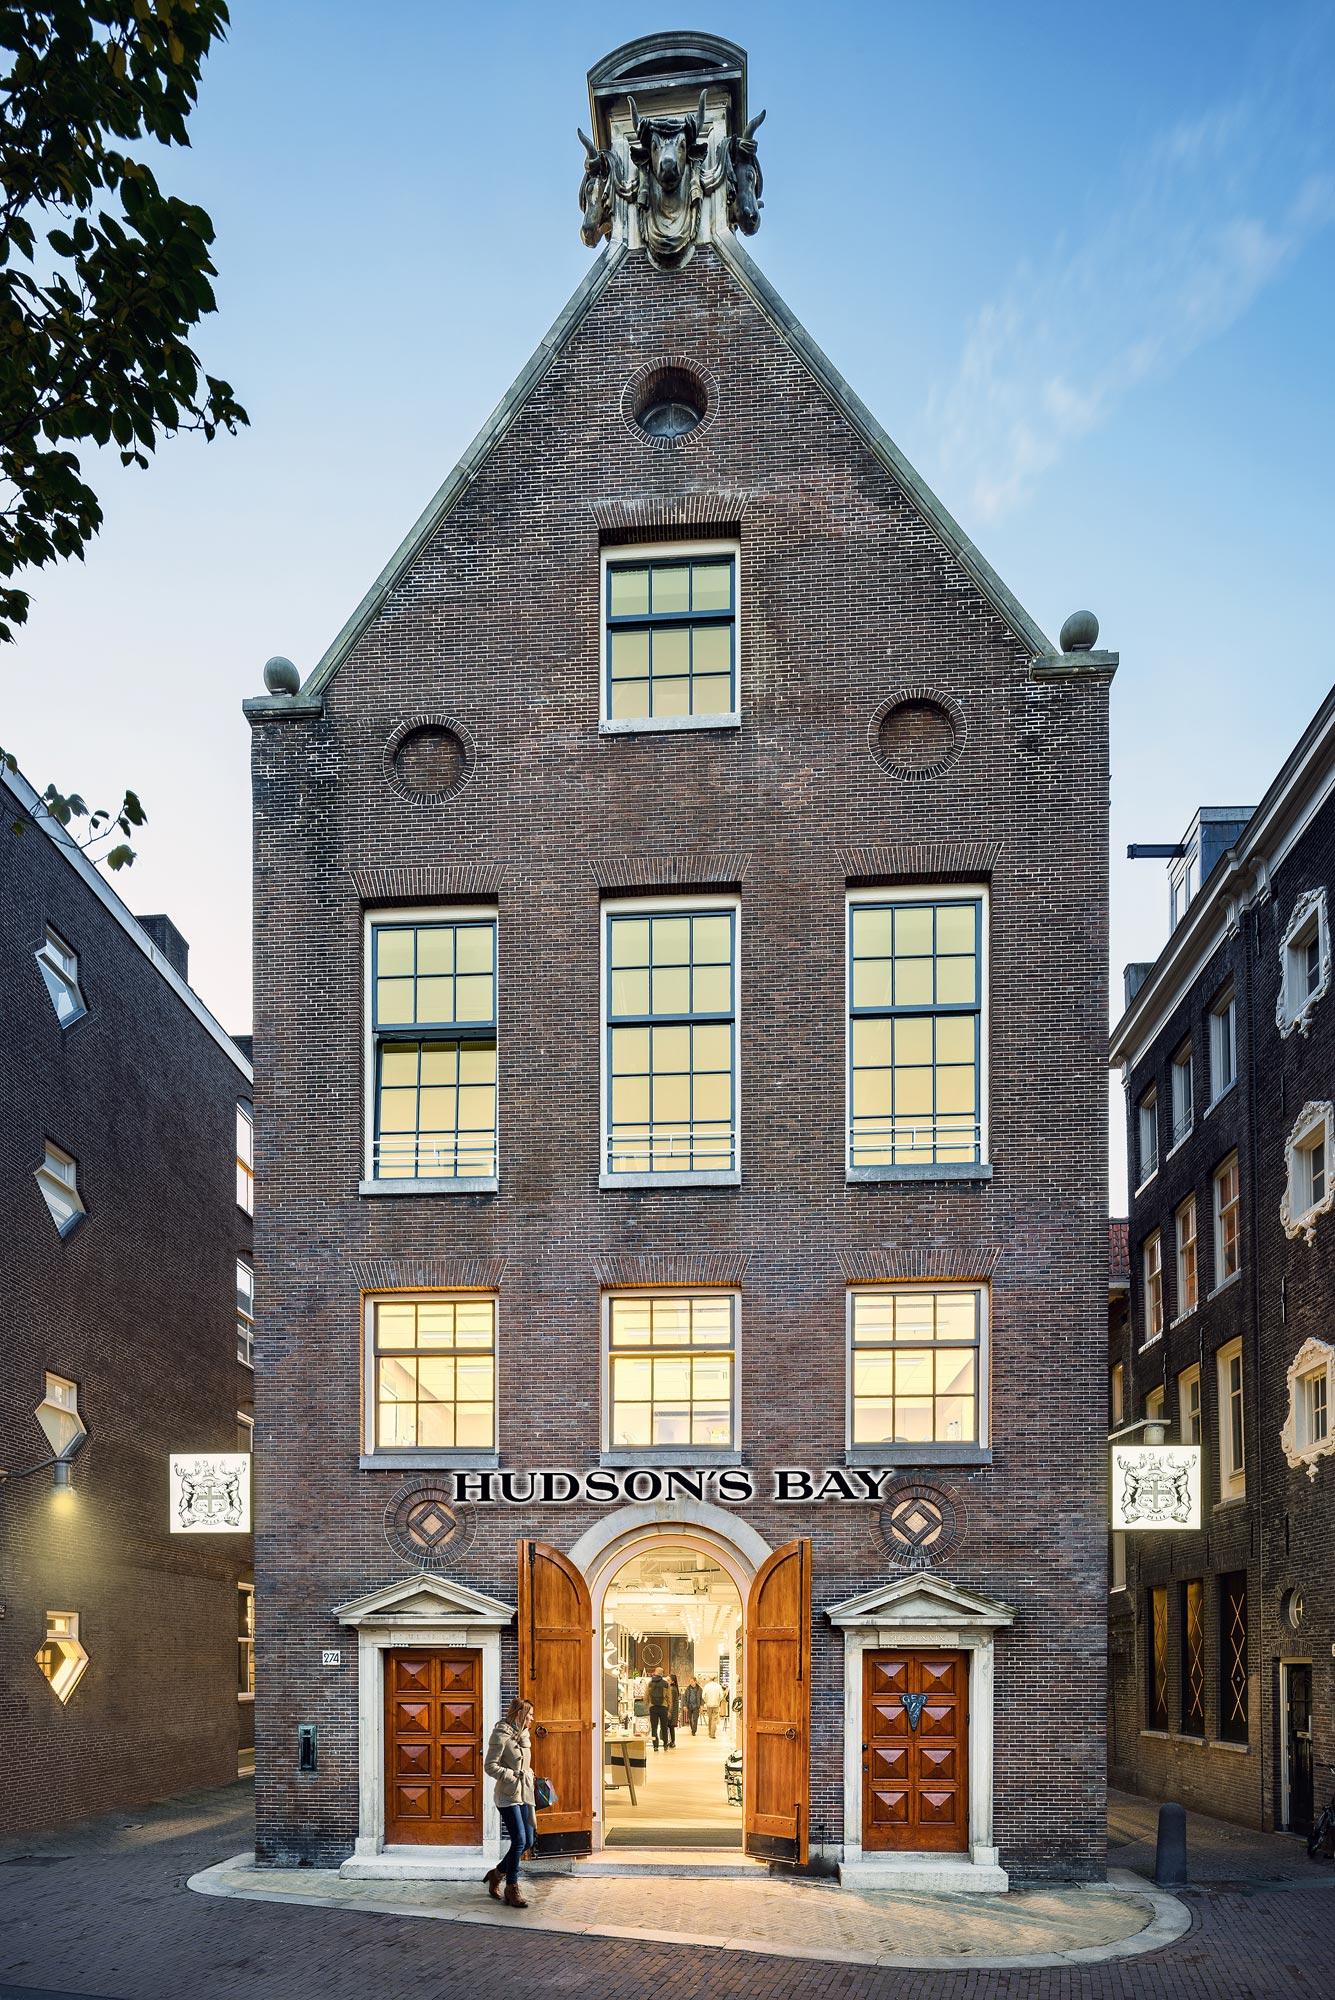 Hudson's Bay - Amsterdam - architectuurfotograaf Chiel de Nooyer